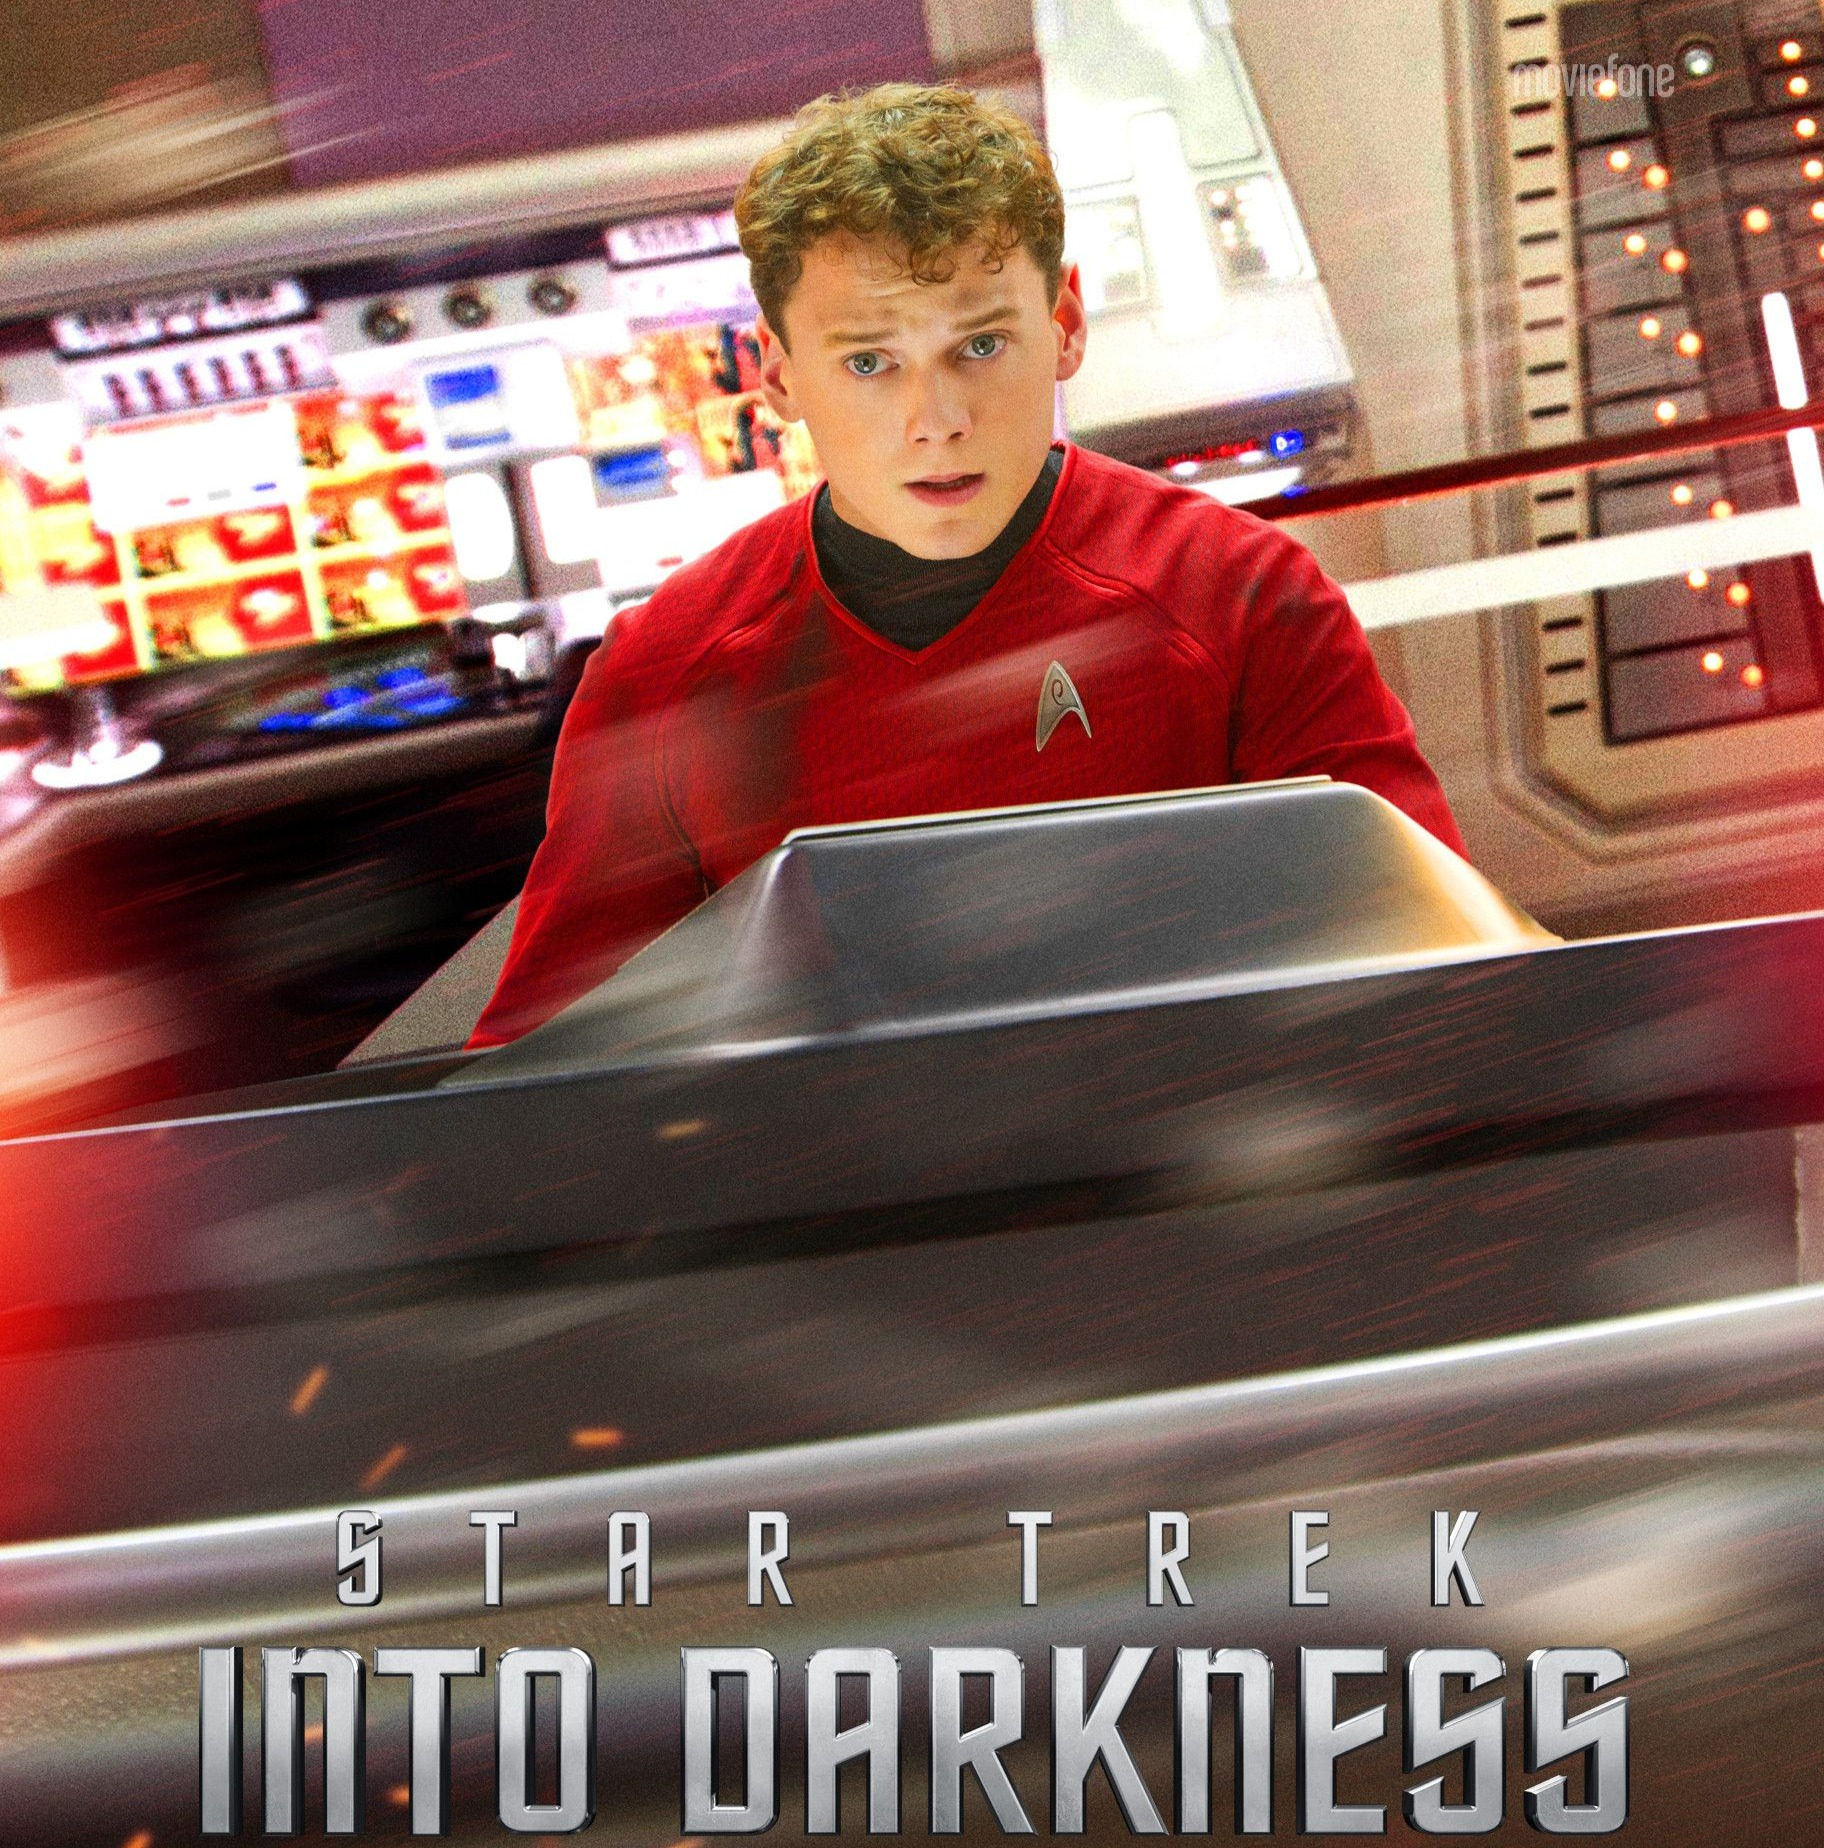 Saga Star Trek de J.J Abrams